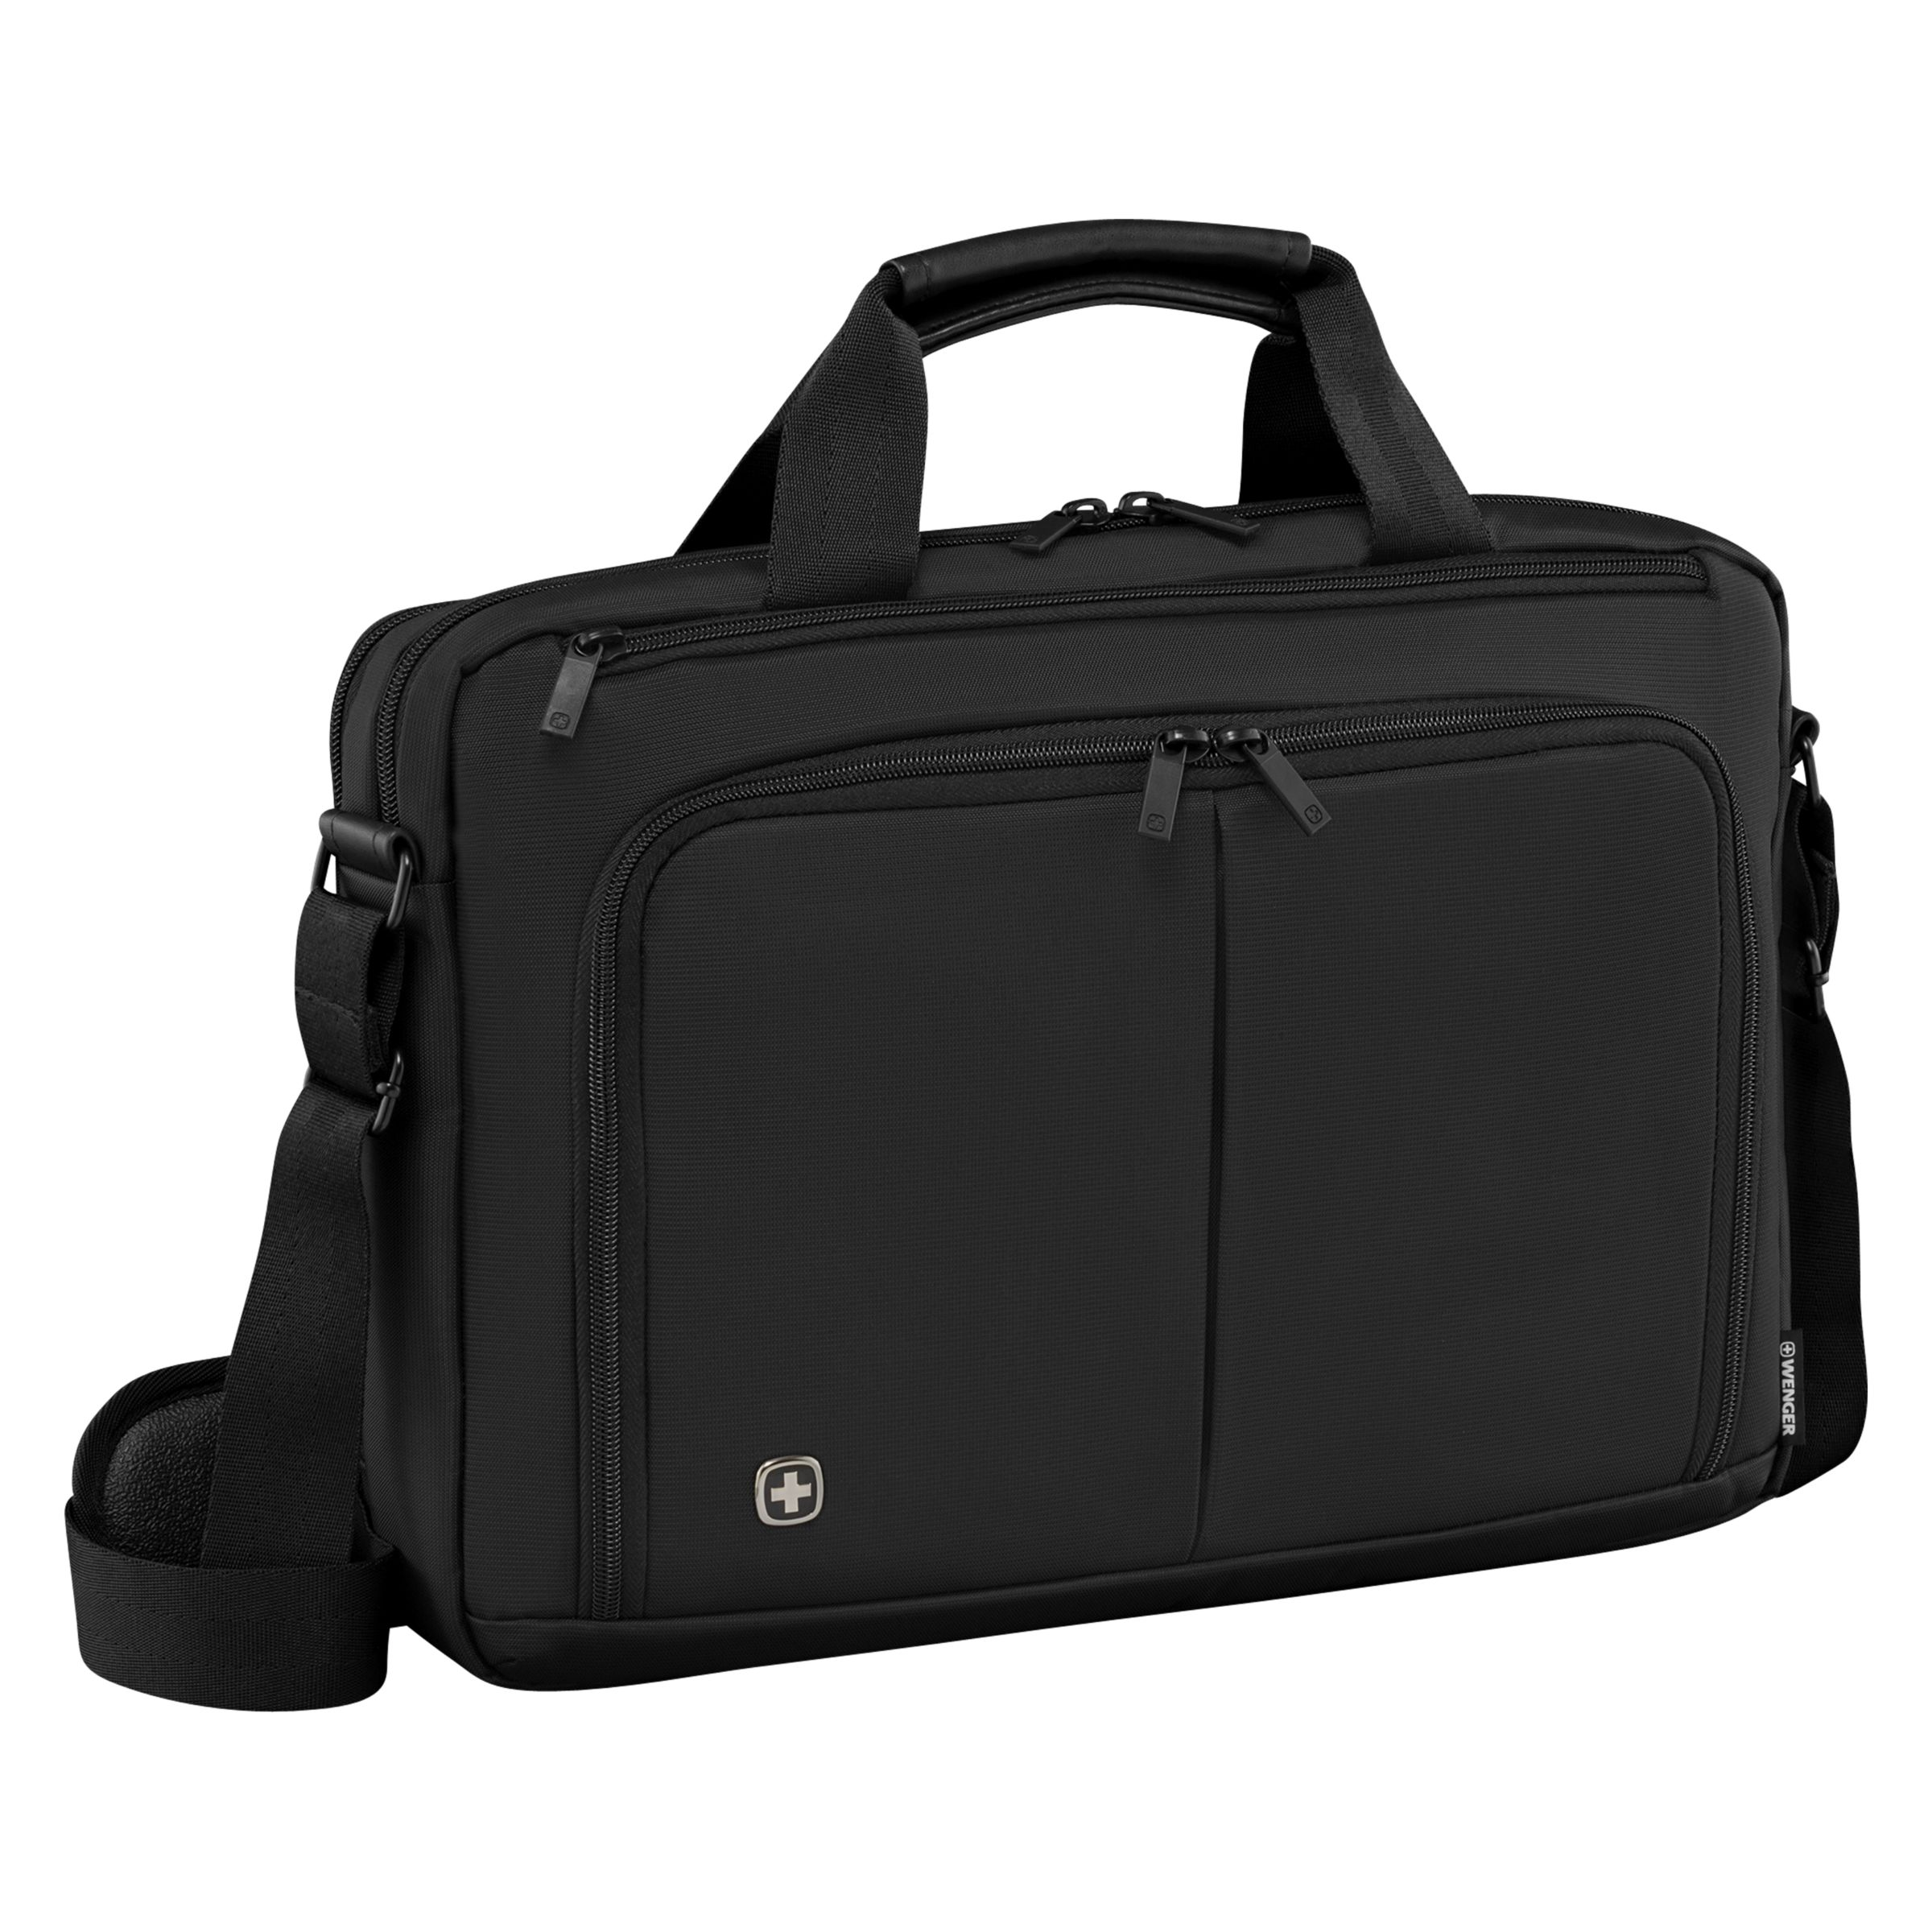 Wenger Wenger Source 16 Laptop Briefcase with Tablet Pocket